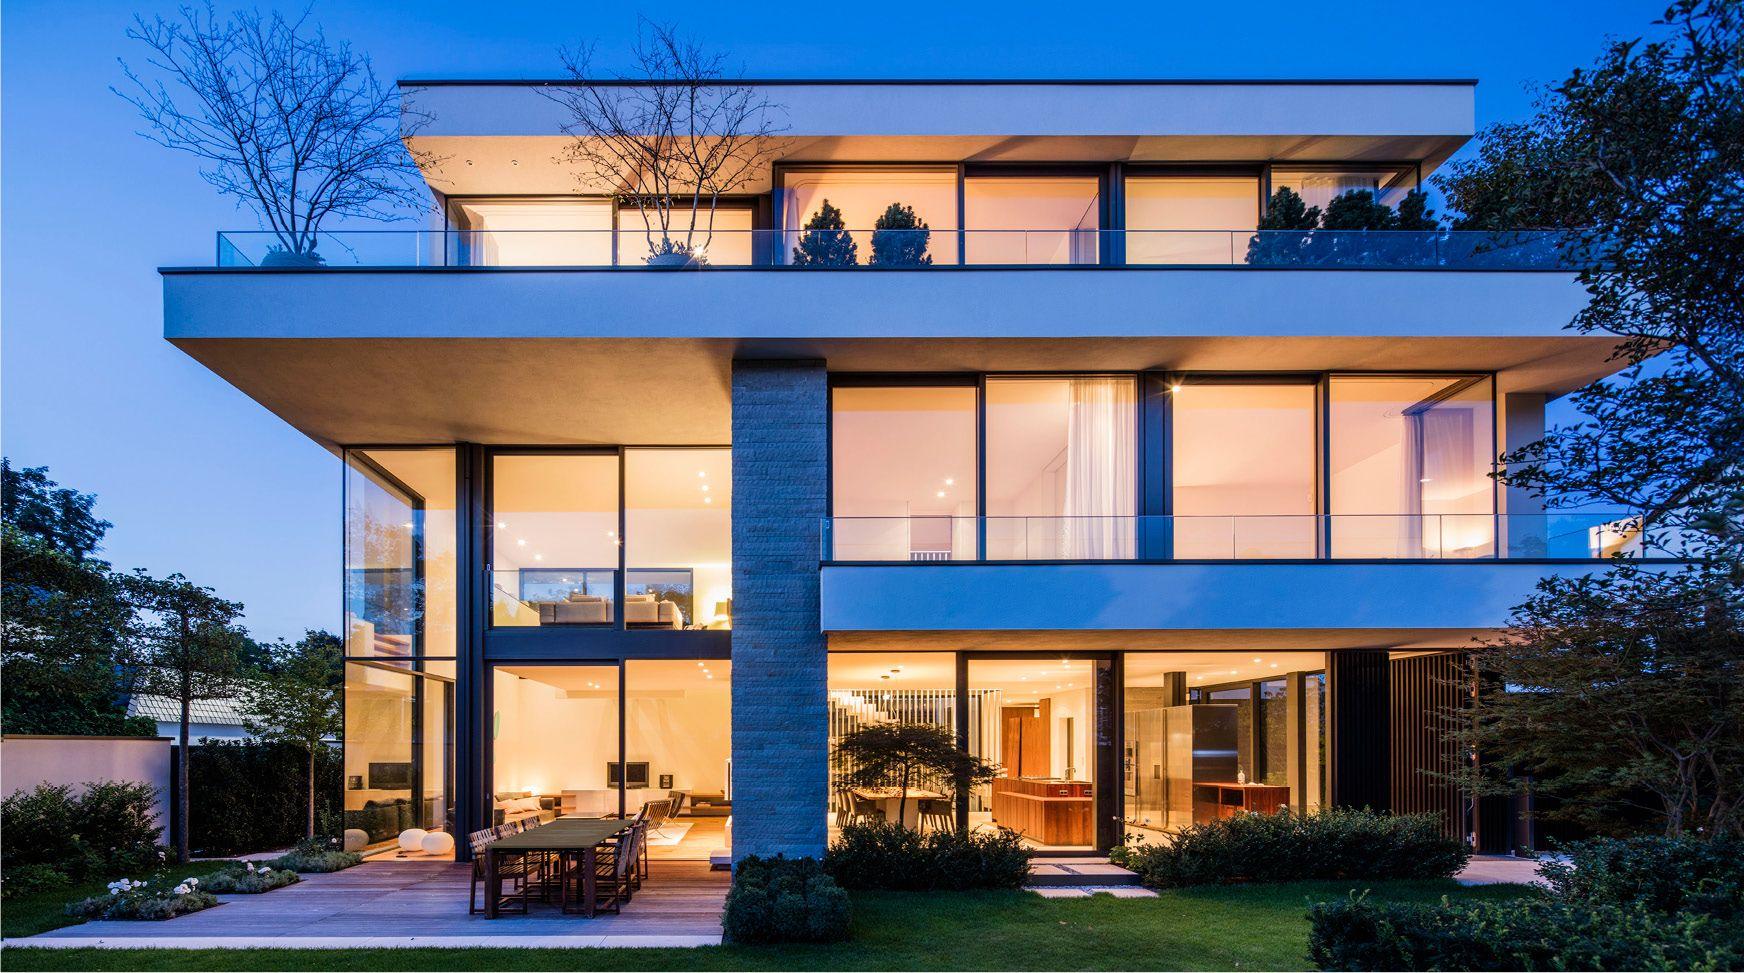 Uberlegen Projekt   Haus TI Frankfurt | Architekten Bda: Fuchs, Wacker.